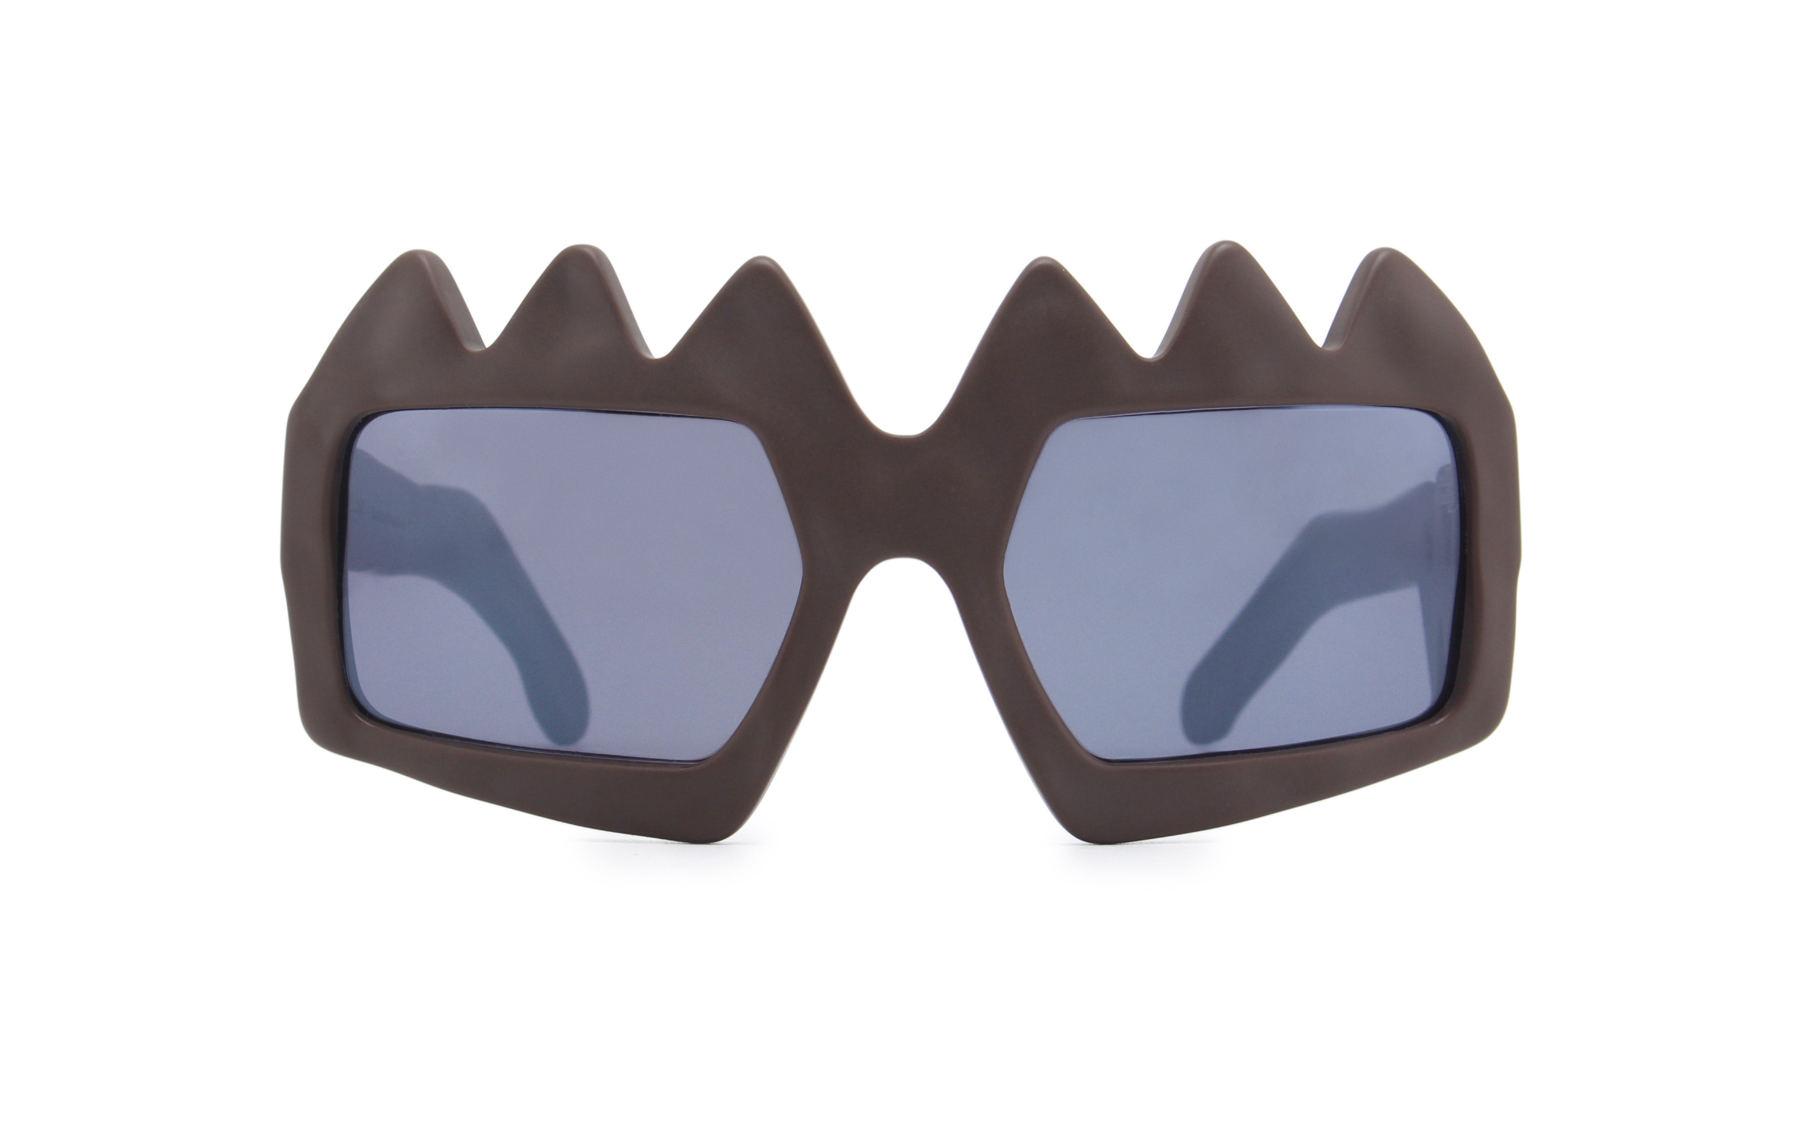 FAKBYFAK x Walter Van Beirendonck  Bliksem Sunglasses. Brown Code: FBF-09-13-02